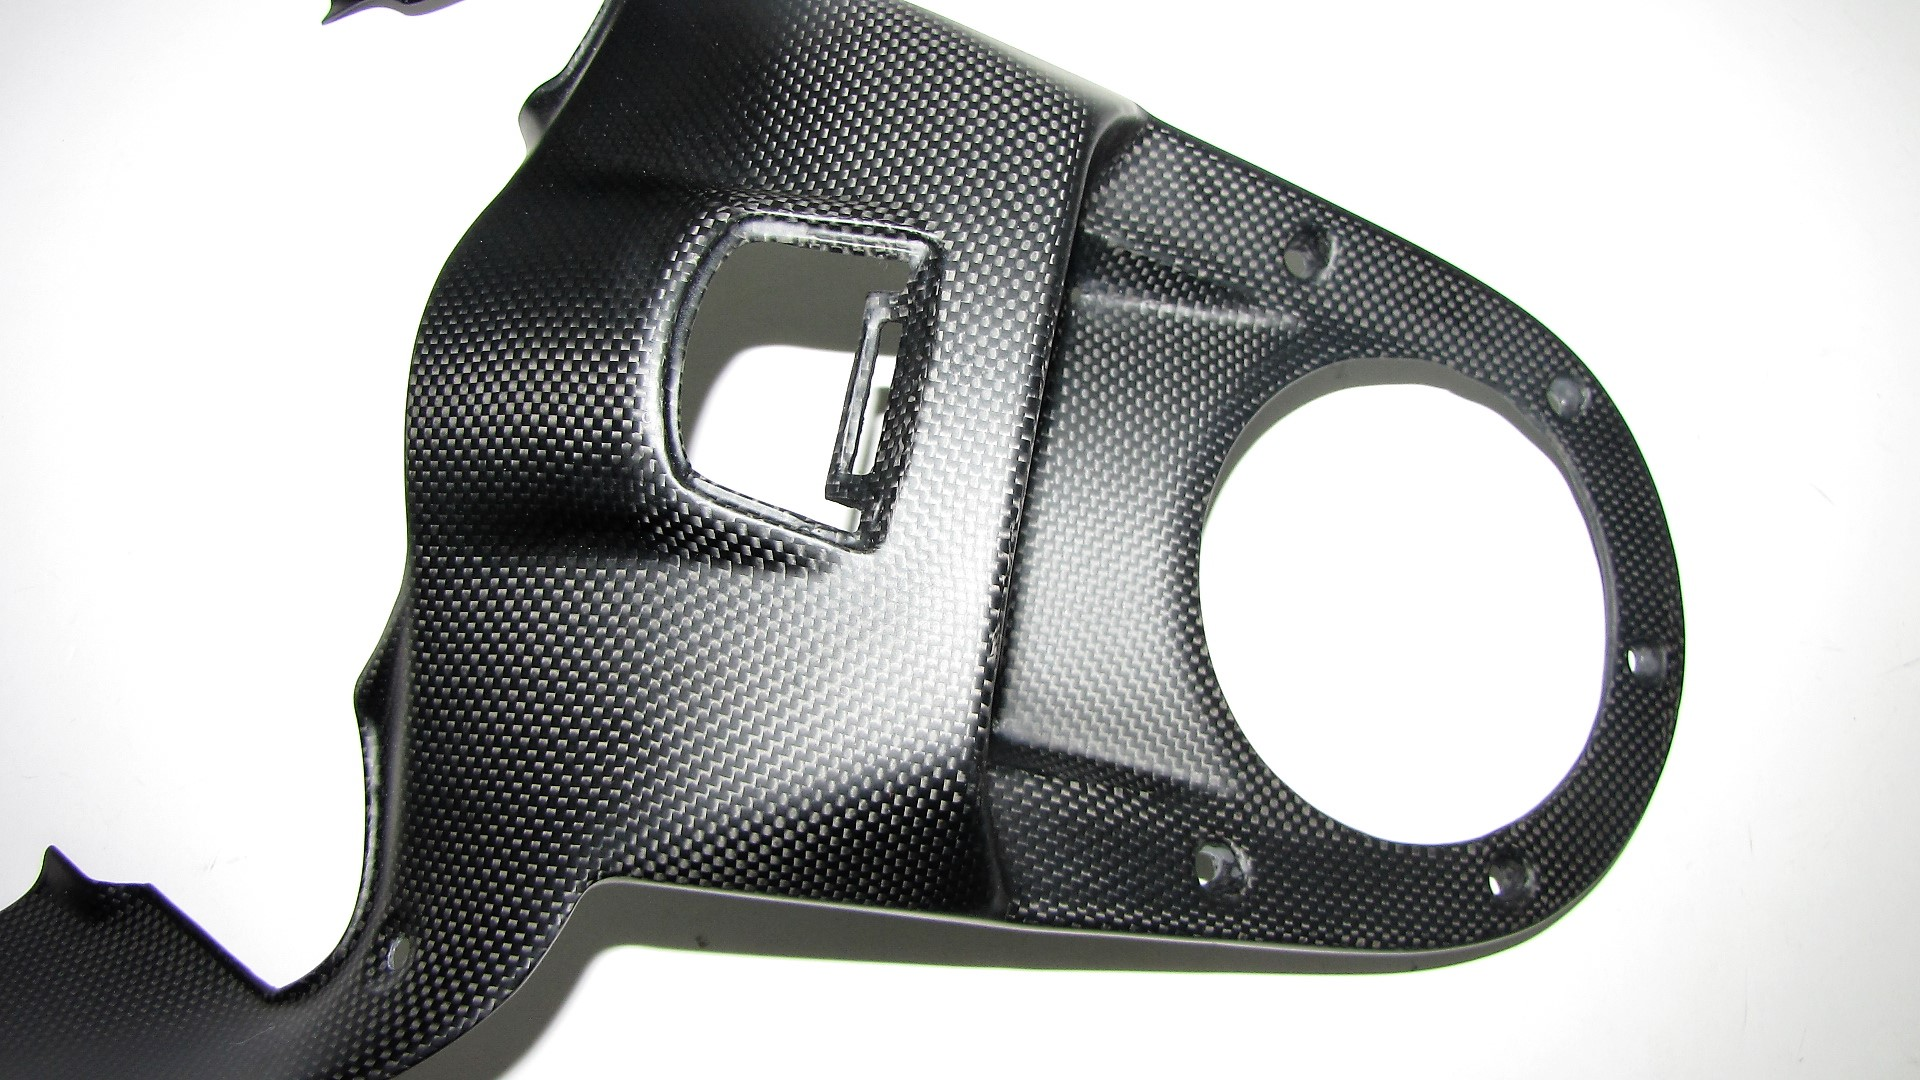 Echt Carbon fein matt Passend für Ducati Diavel 2011 Tank Abdeckung